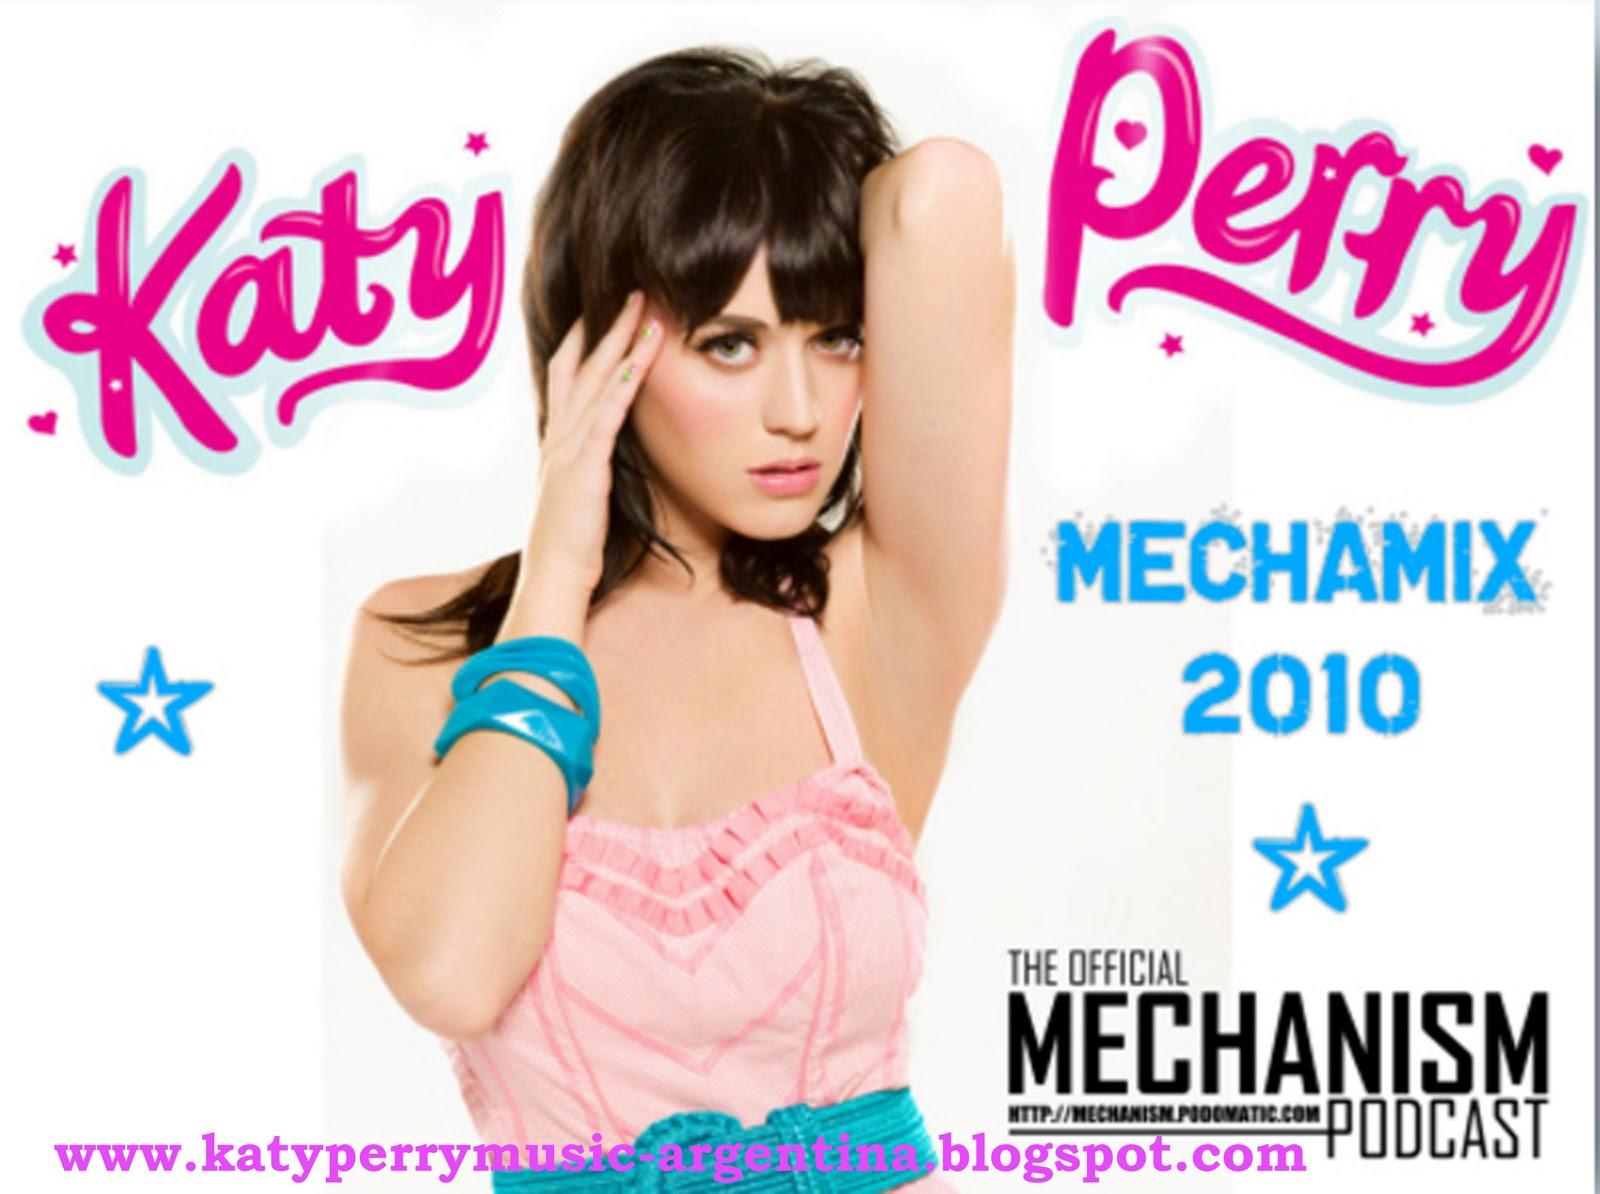 http://4.bp.blogspot.com/_mi1dvg0RzGg/TUQx92KiyQI/AAAAAAAAABQ/YzLcVDlEgHc/s1600/Katy+Perry+Mechamix+2010.jpg